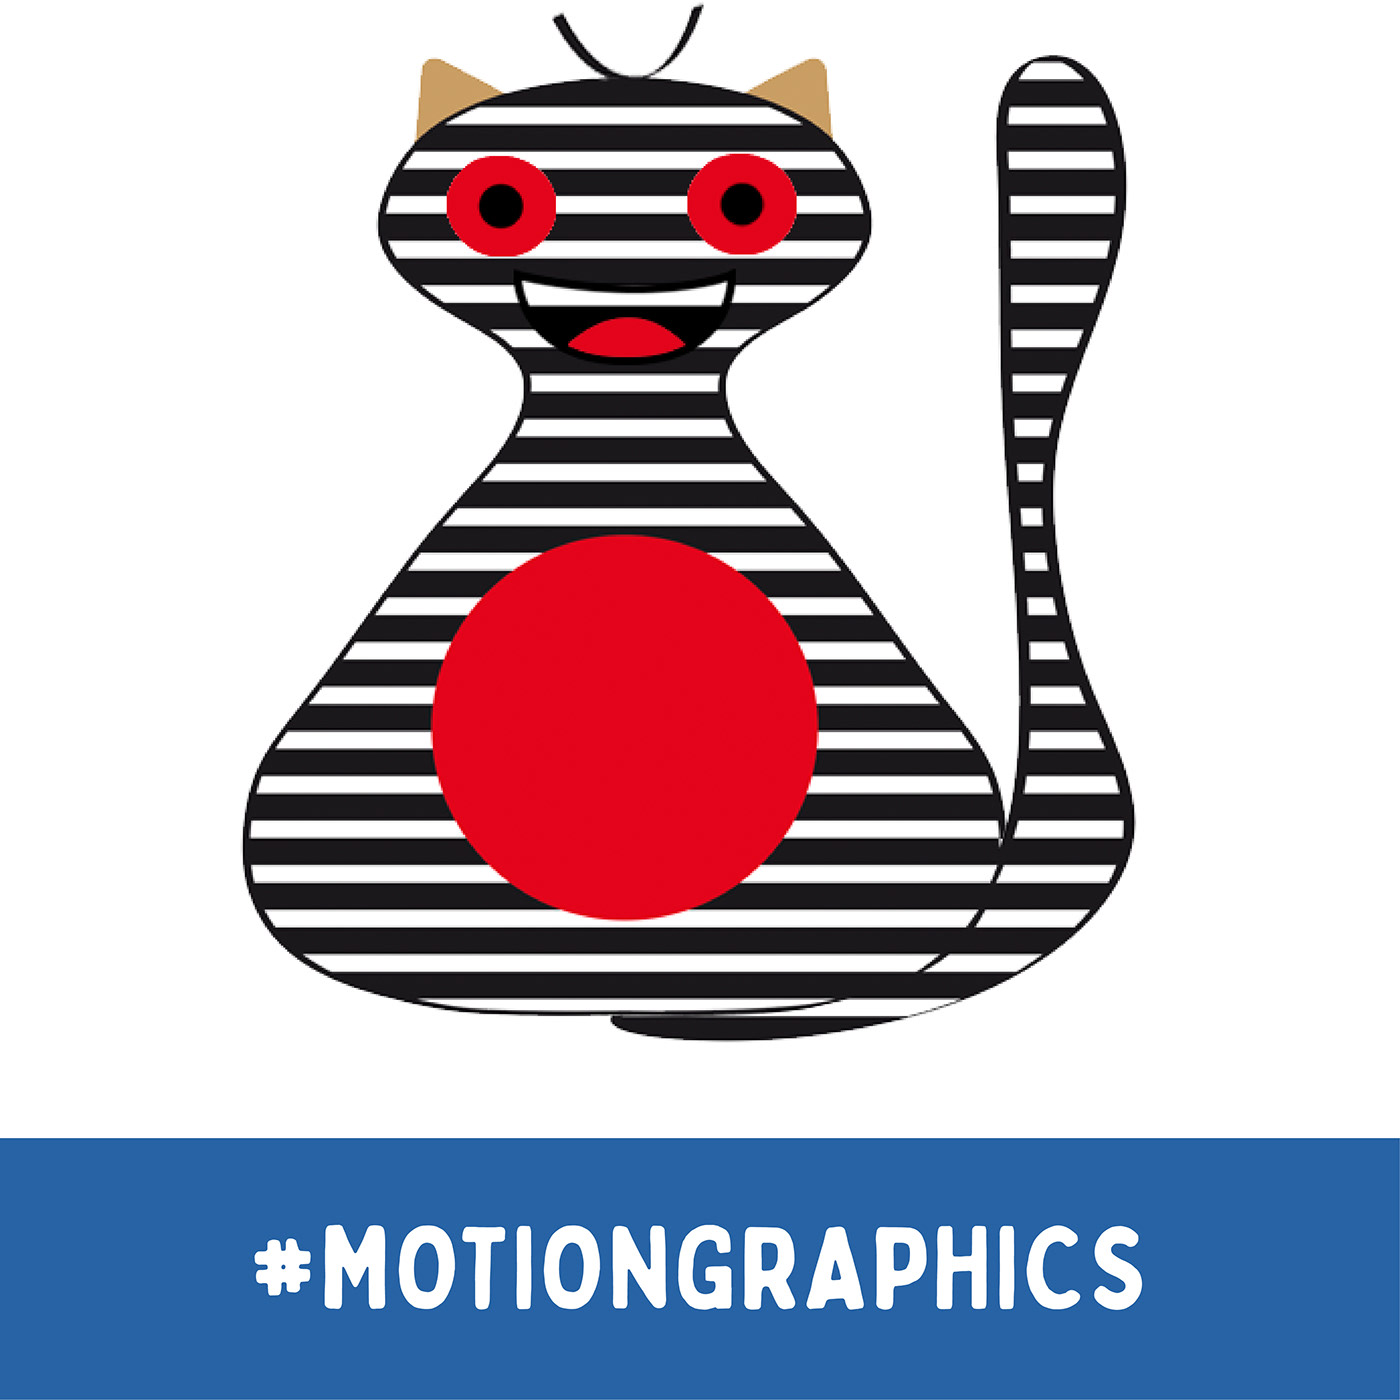 2DAnimation ArtDirection cartoon characteranimator characterart characterdesign graphicdesign ILLUSTRATION  motiongraphics puppets